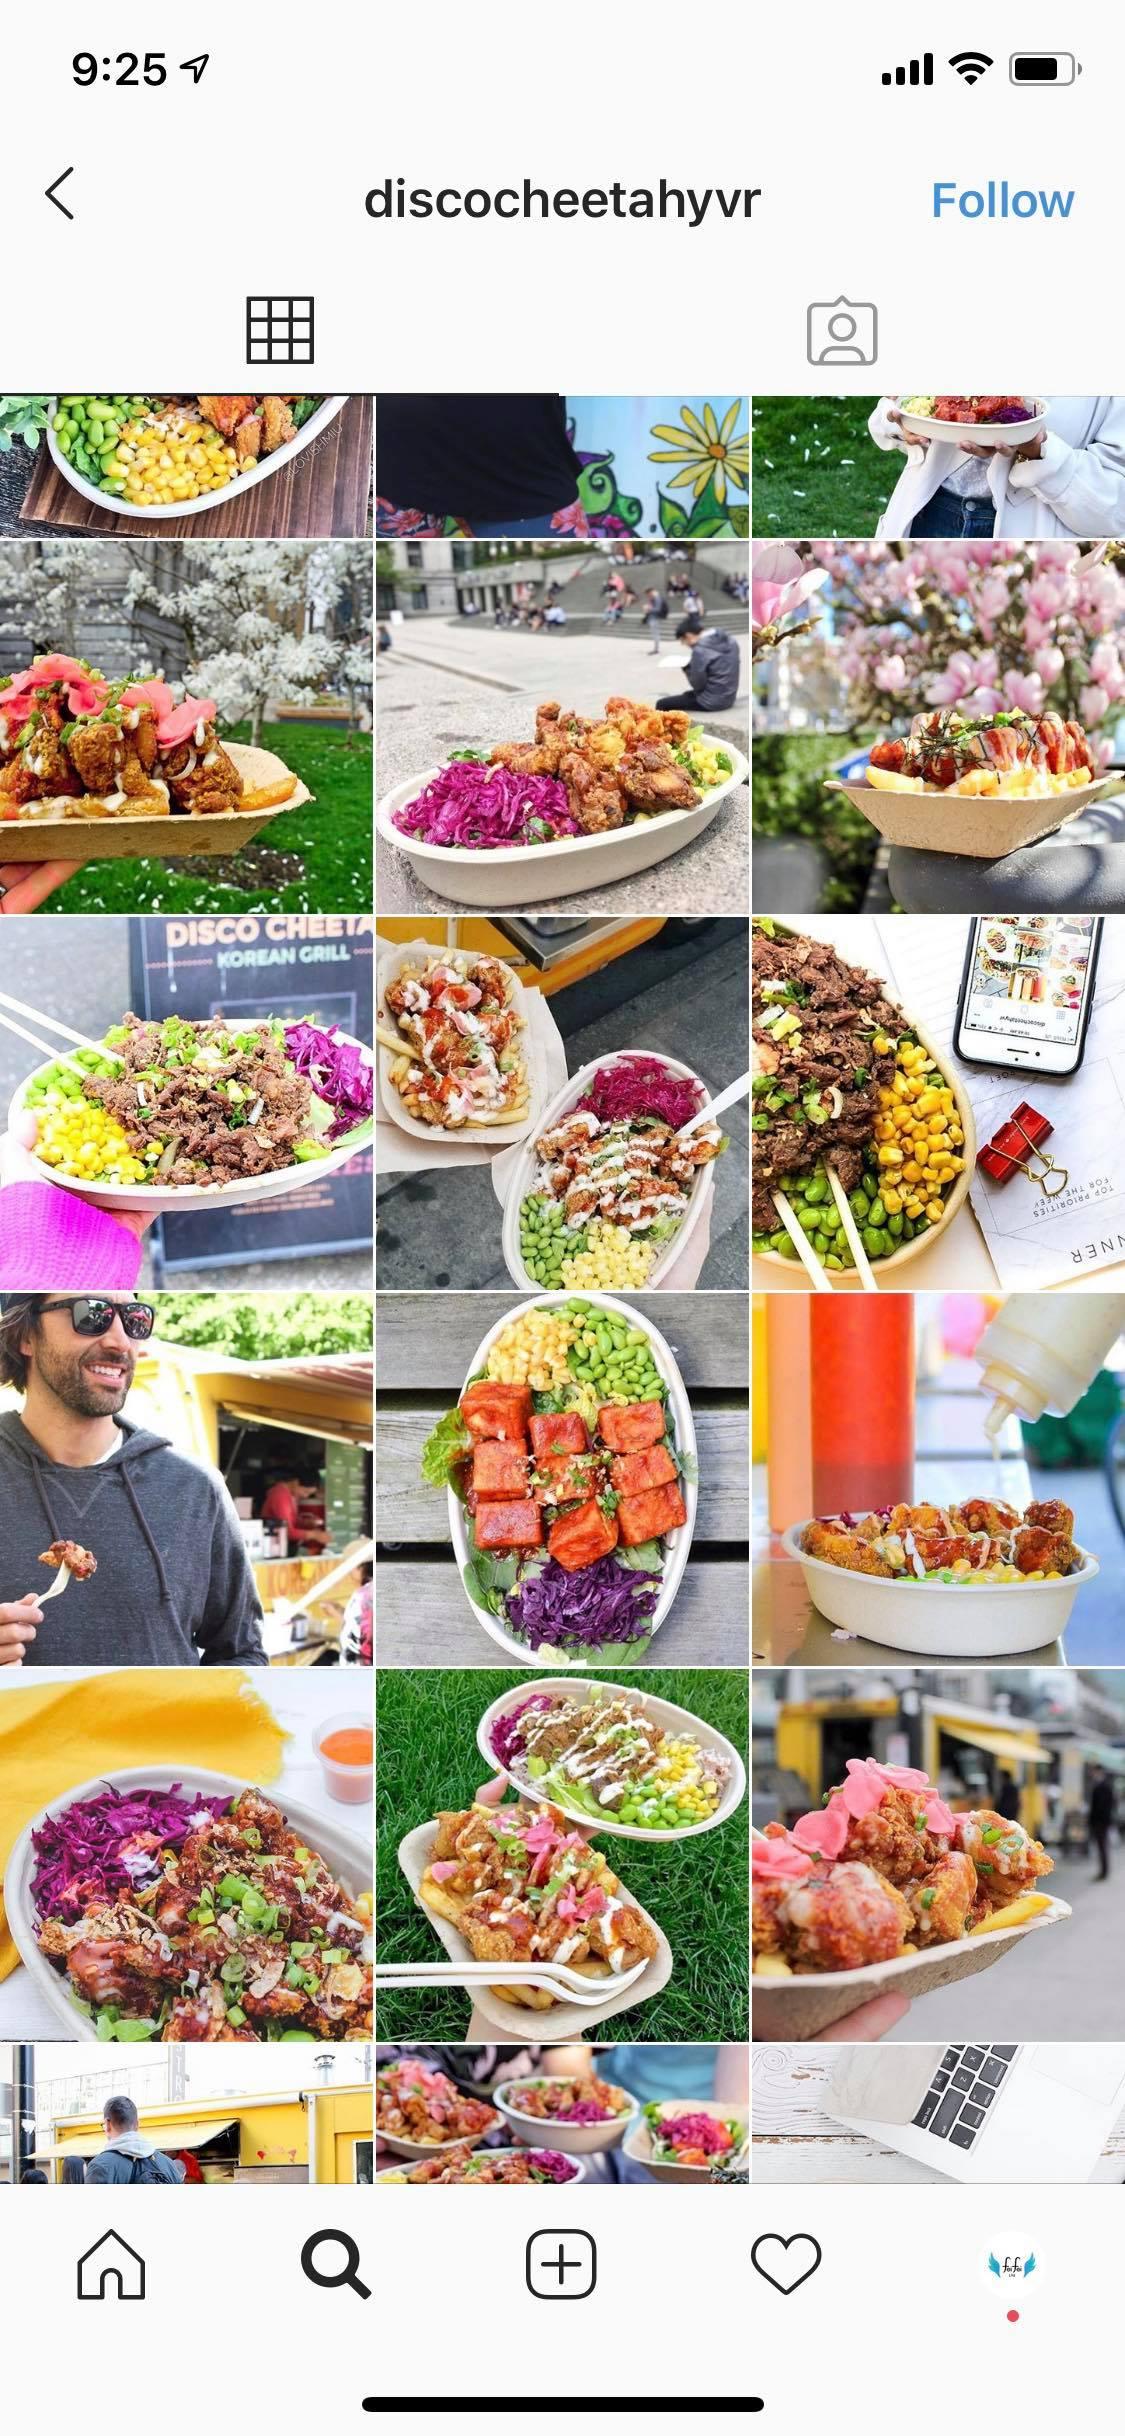 Discocheetah Instagram food posts Vancouver under Legendary Social Media Community management contracted by Feifei Digital Ltd | Monika Szucs